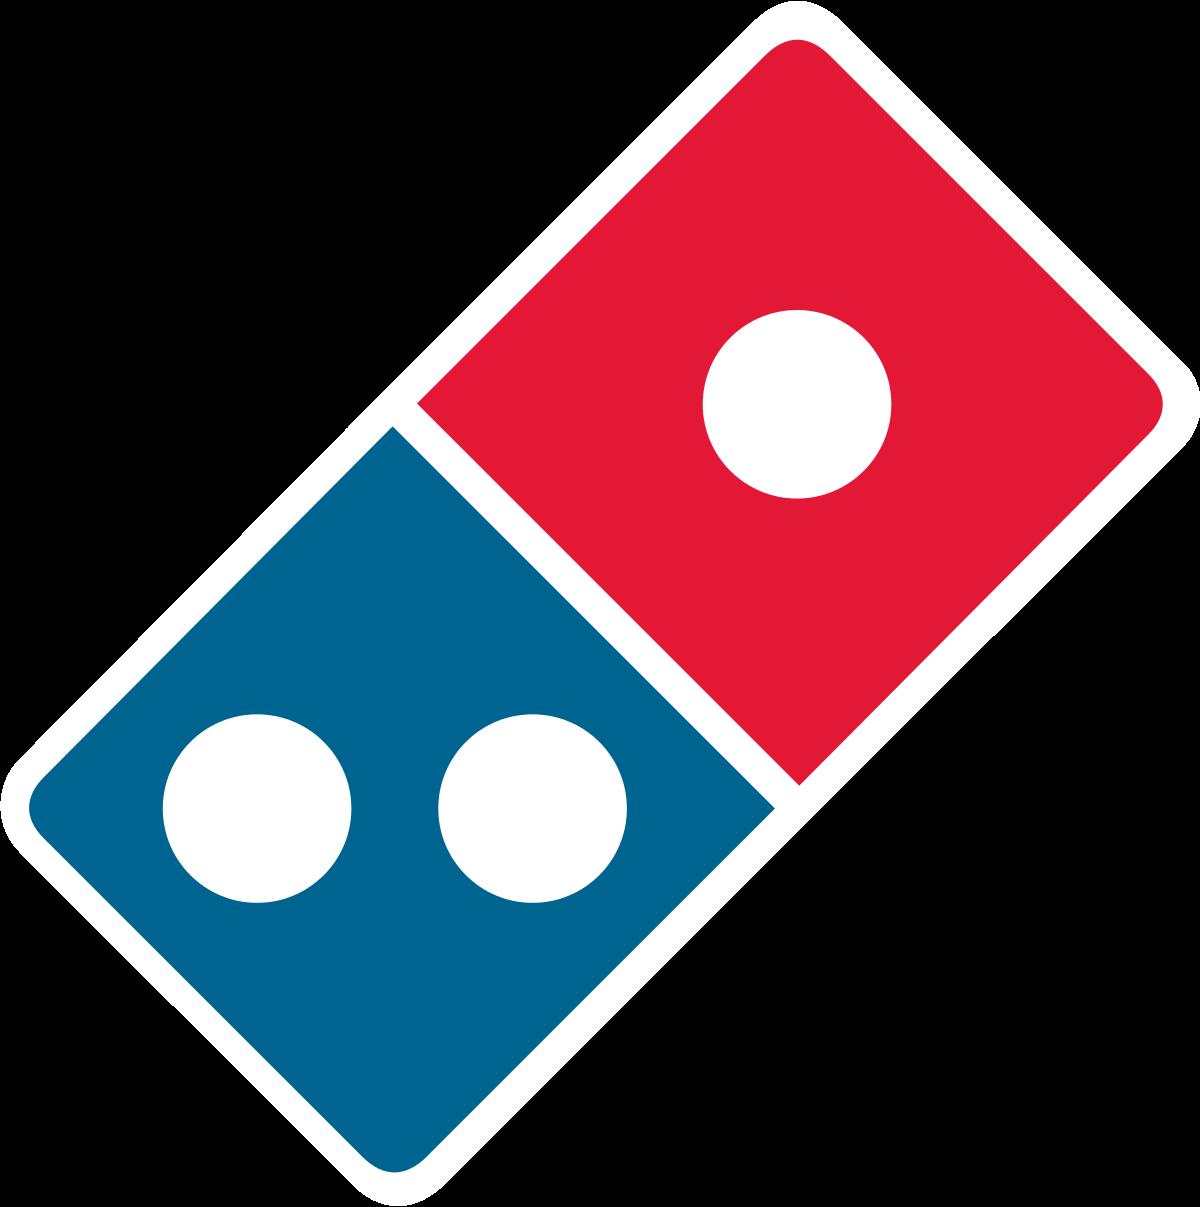 Dominos Pizza UK & IRL Plc logo